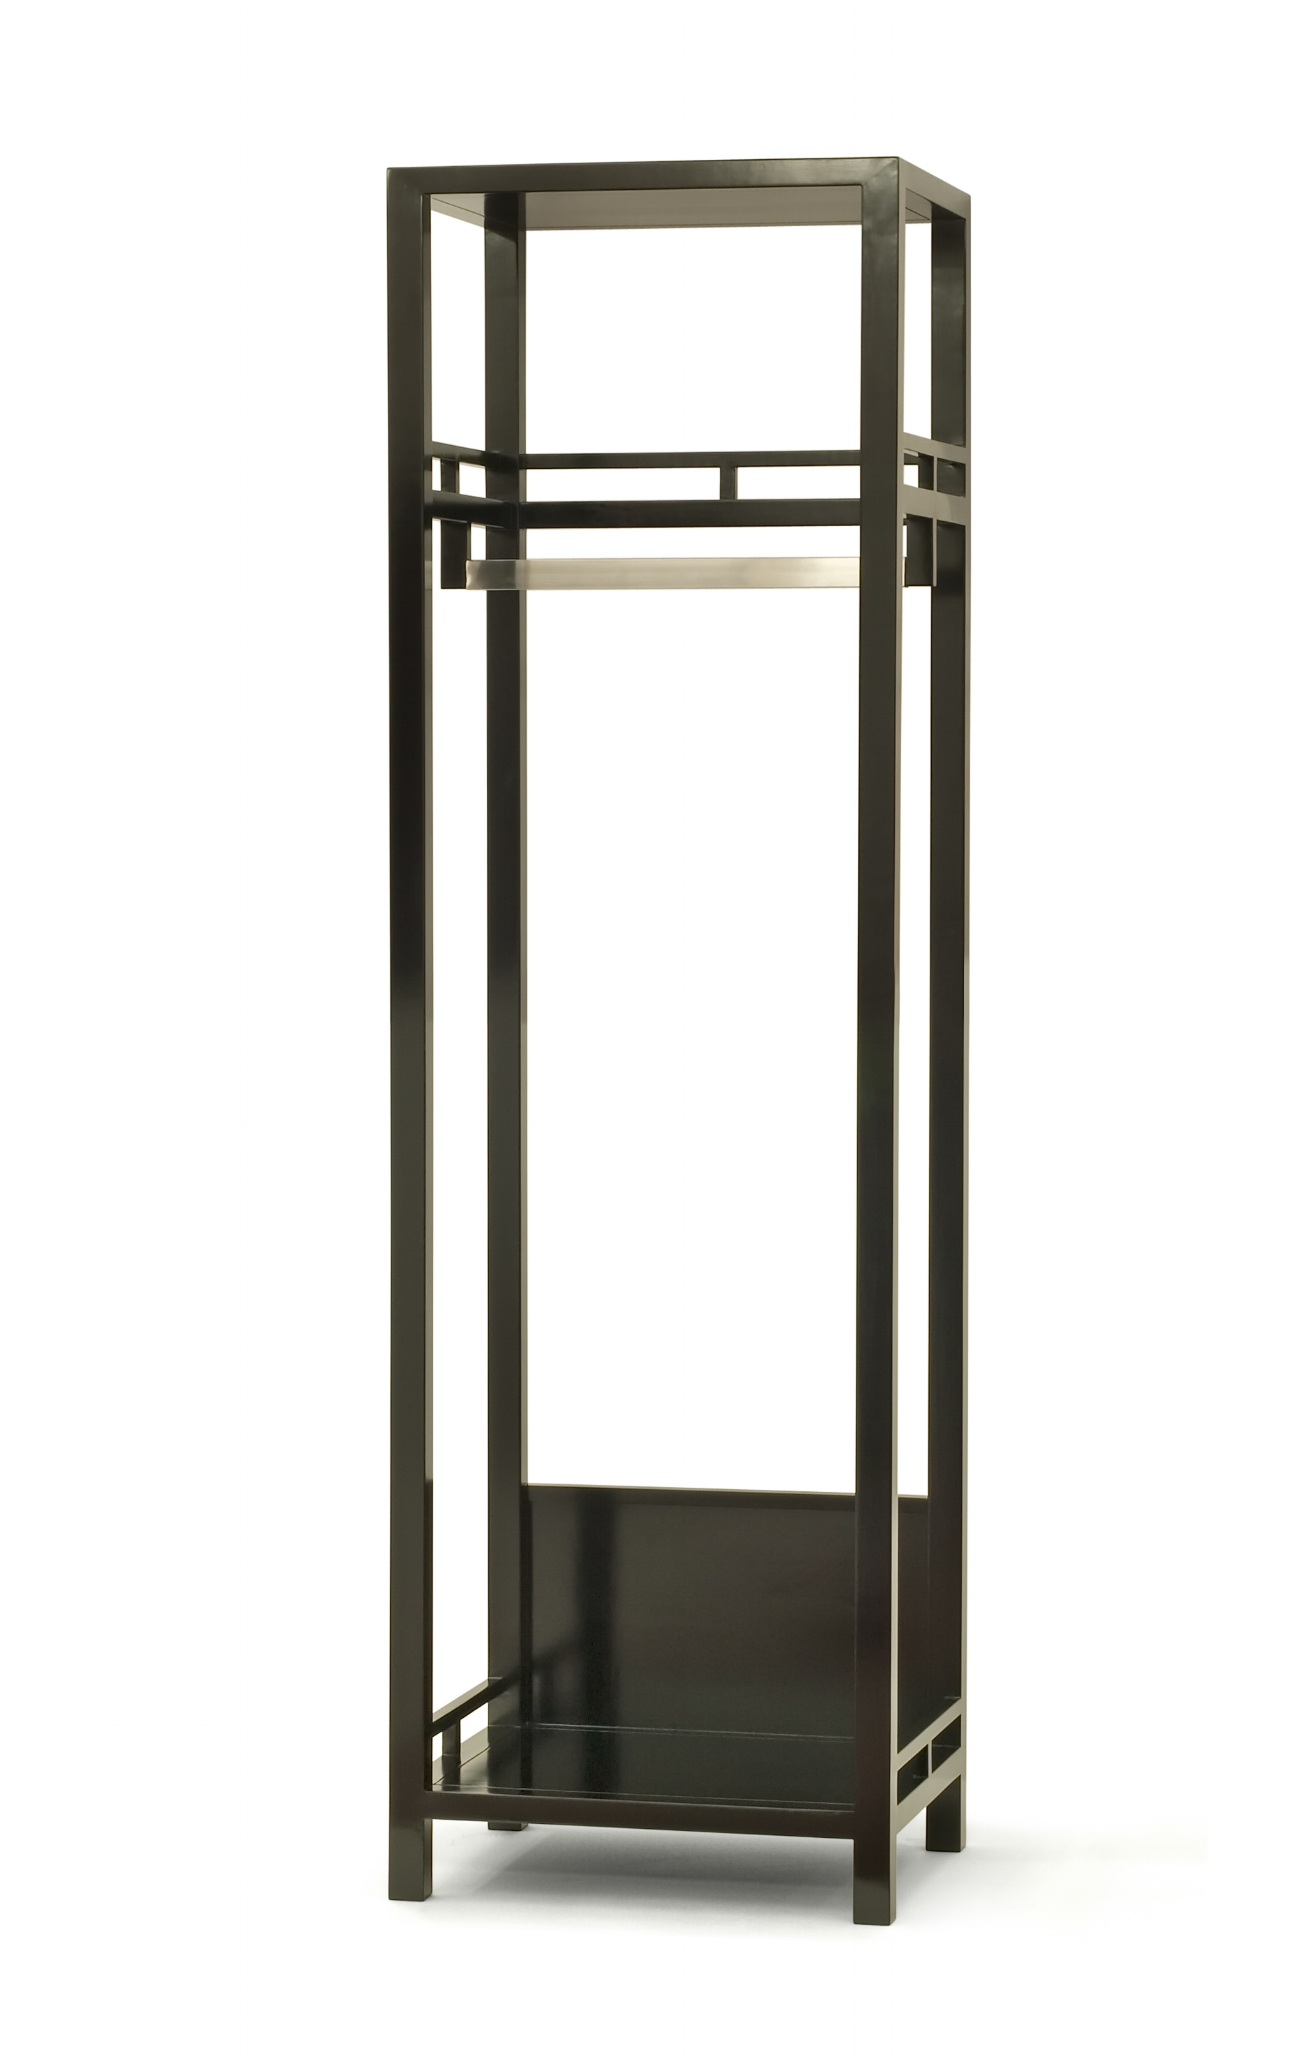 ....Bespoke Ming Style Chinese furniture : Clothes Hanging Shelf..特别定制明式中式家具: 挂衣架....